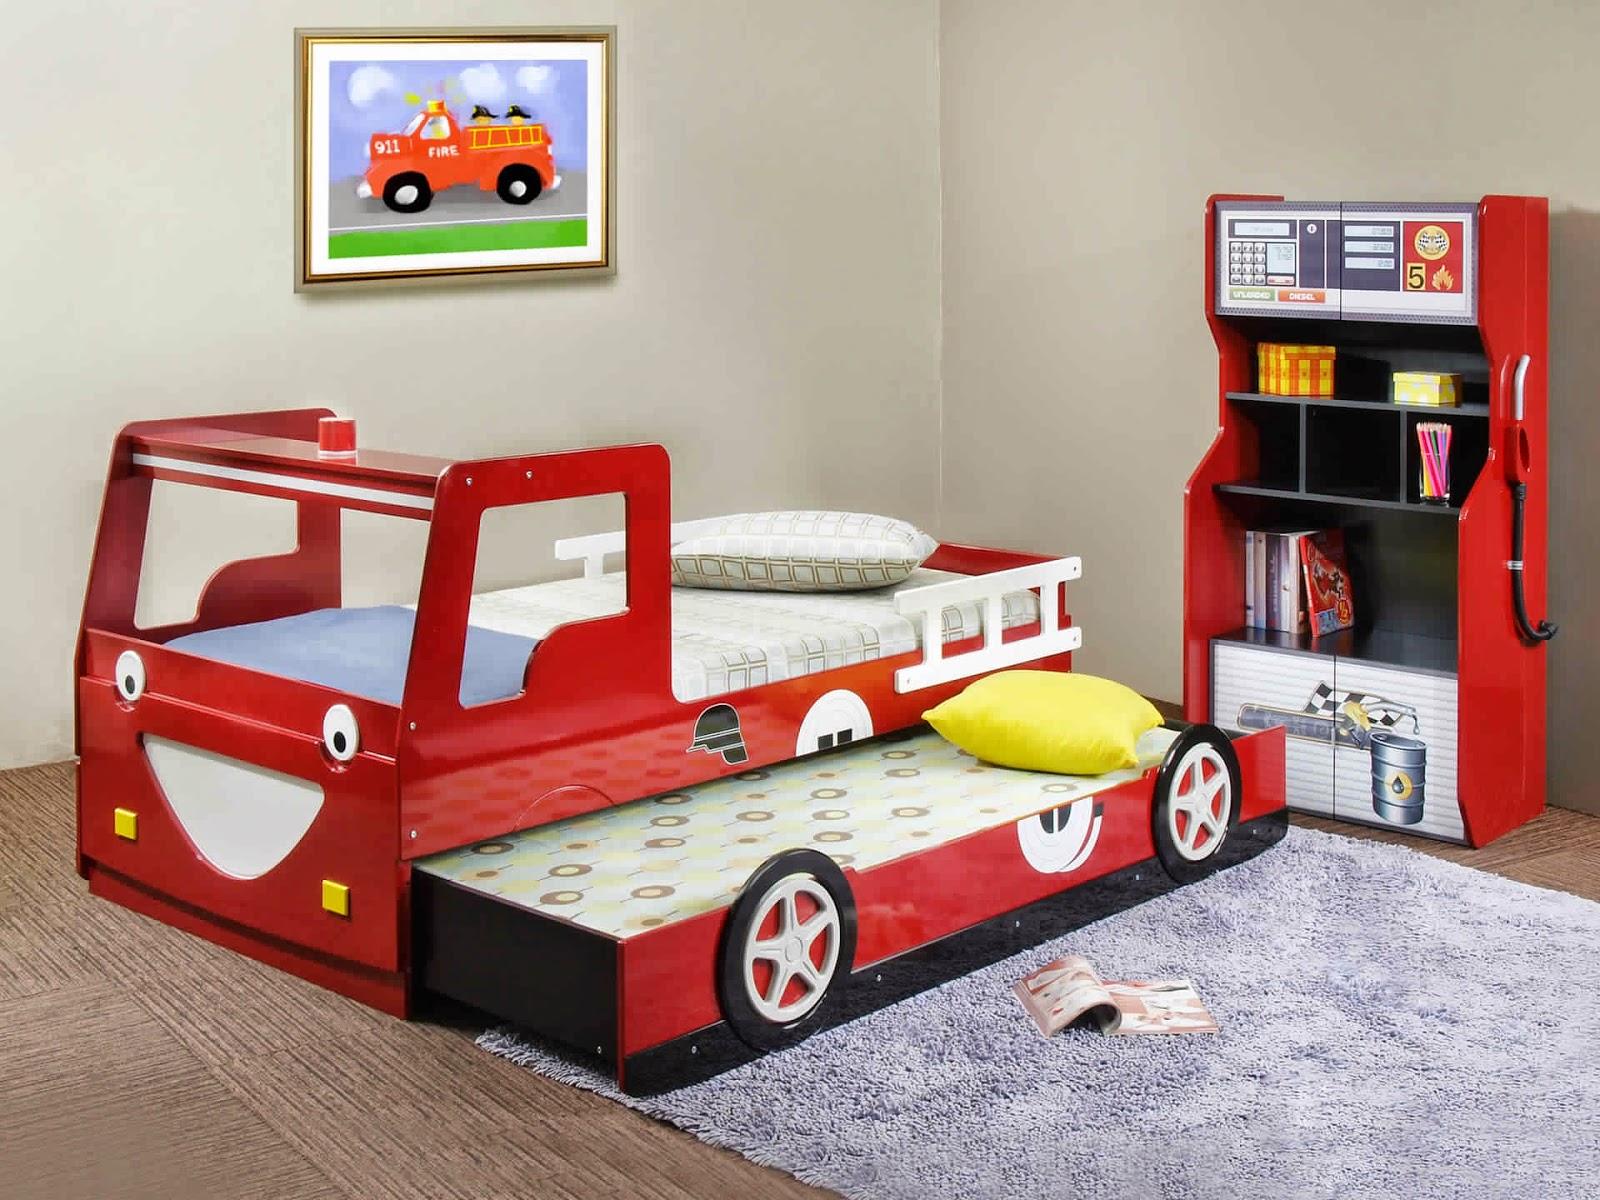 بالصور اشكال وافكار تصميمات سرير اطفال موردن بالصور 20160701 549